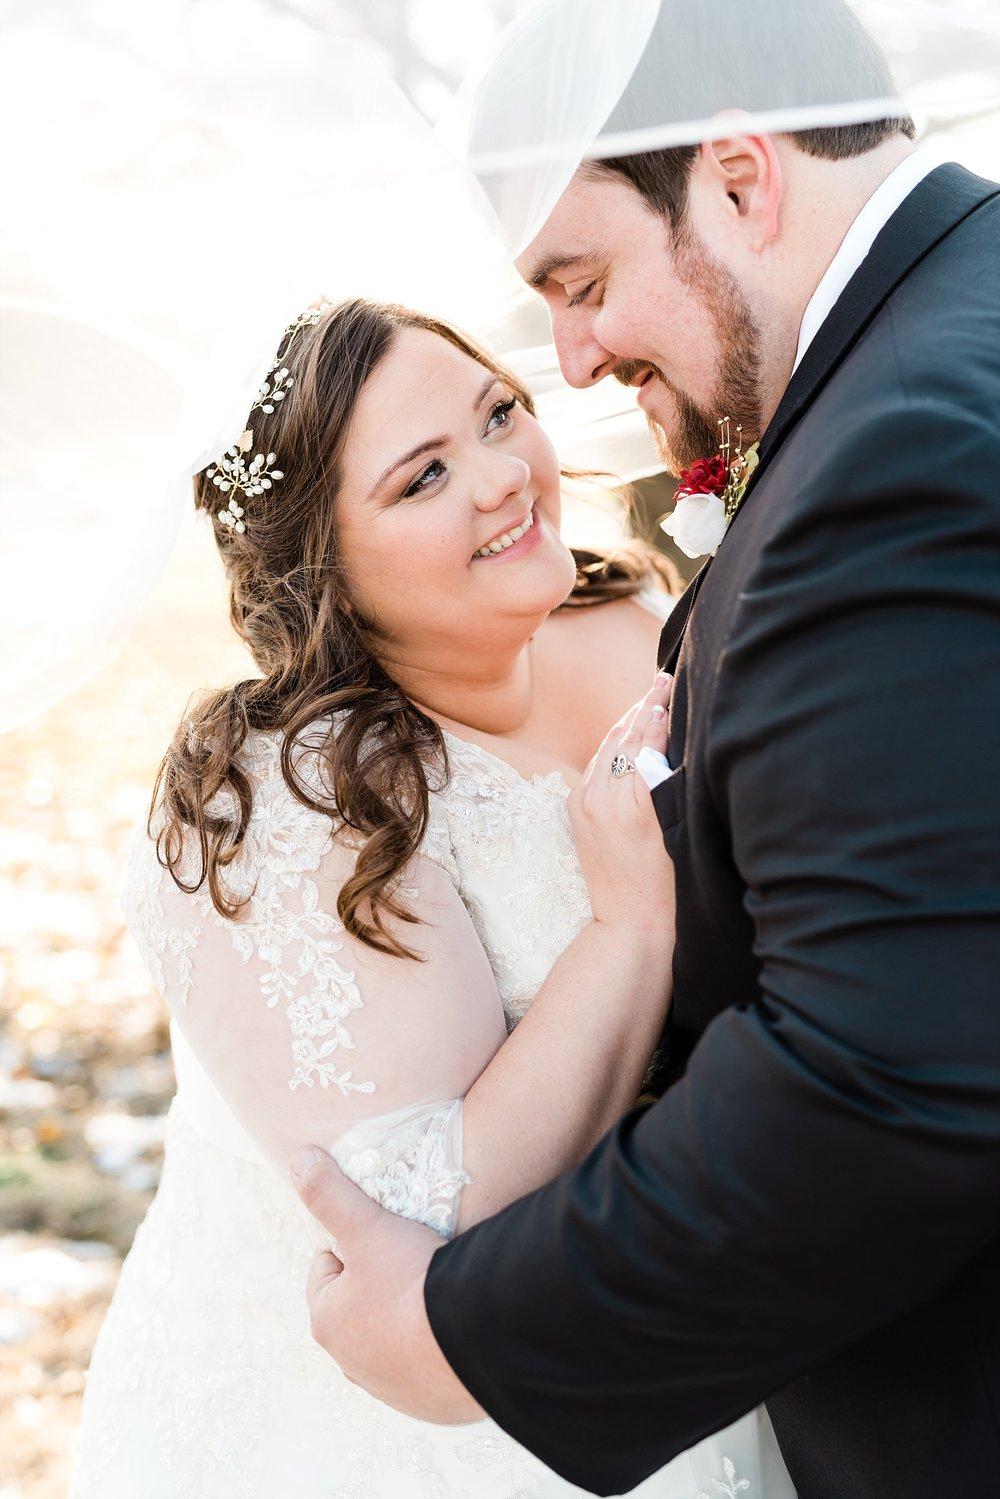 Golden Winter Wedding at The Legacy Barn in Barnett Missouri by Kelsi Kliethermes Photography Columbia Missouri Wedding Photographer_0028.jpg